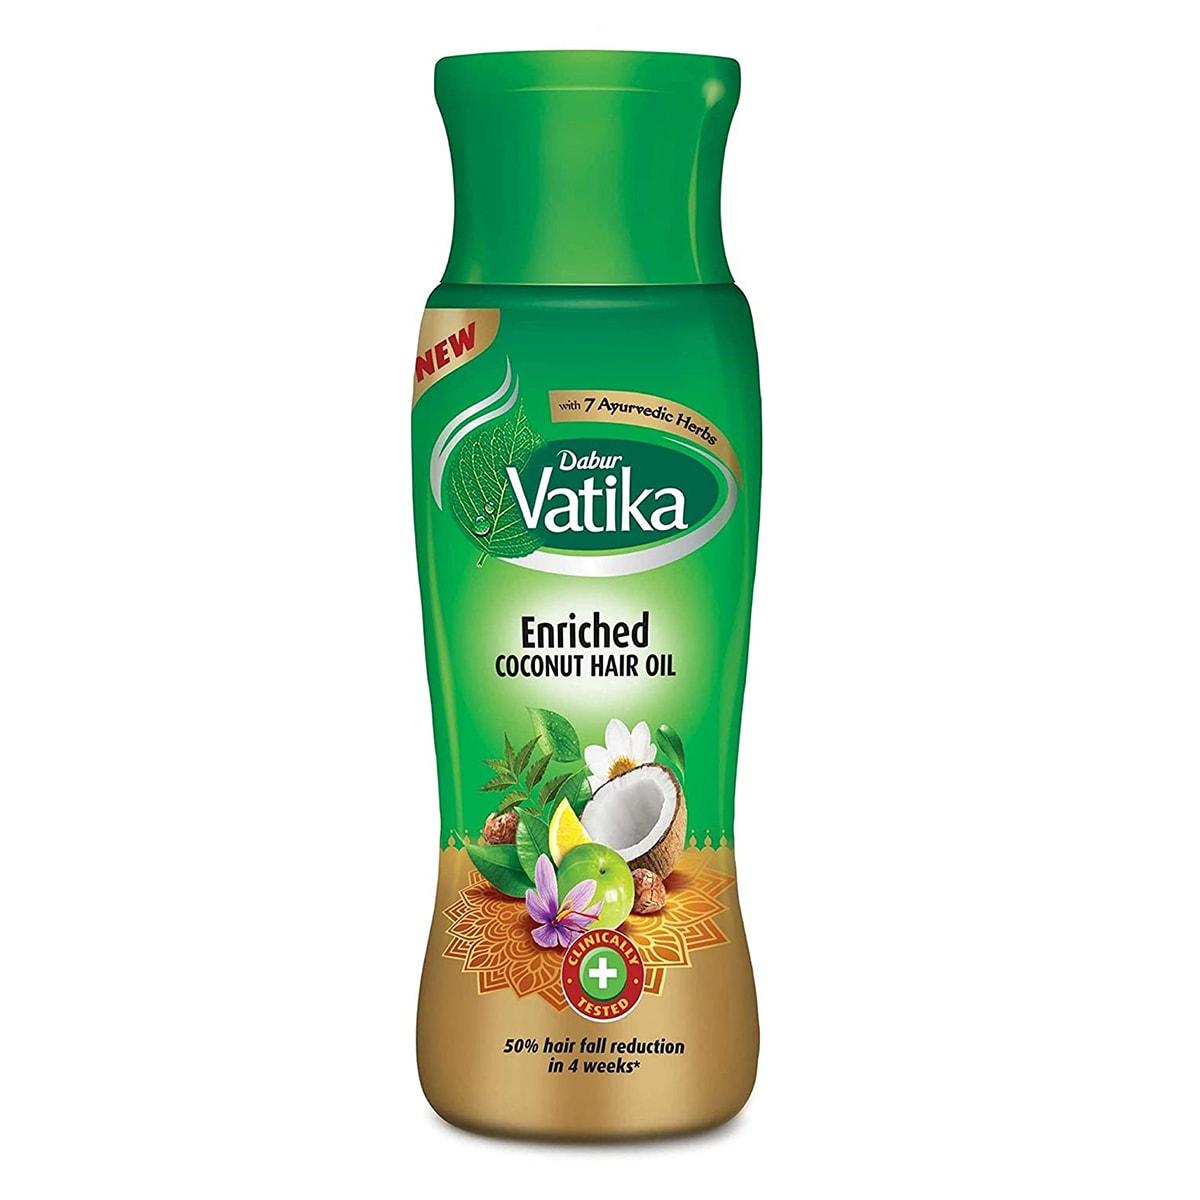 Buy Dabur Vatika Enriched Coconut Hair Oil - 300 ml